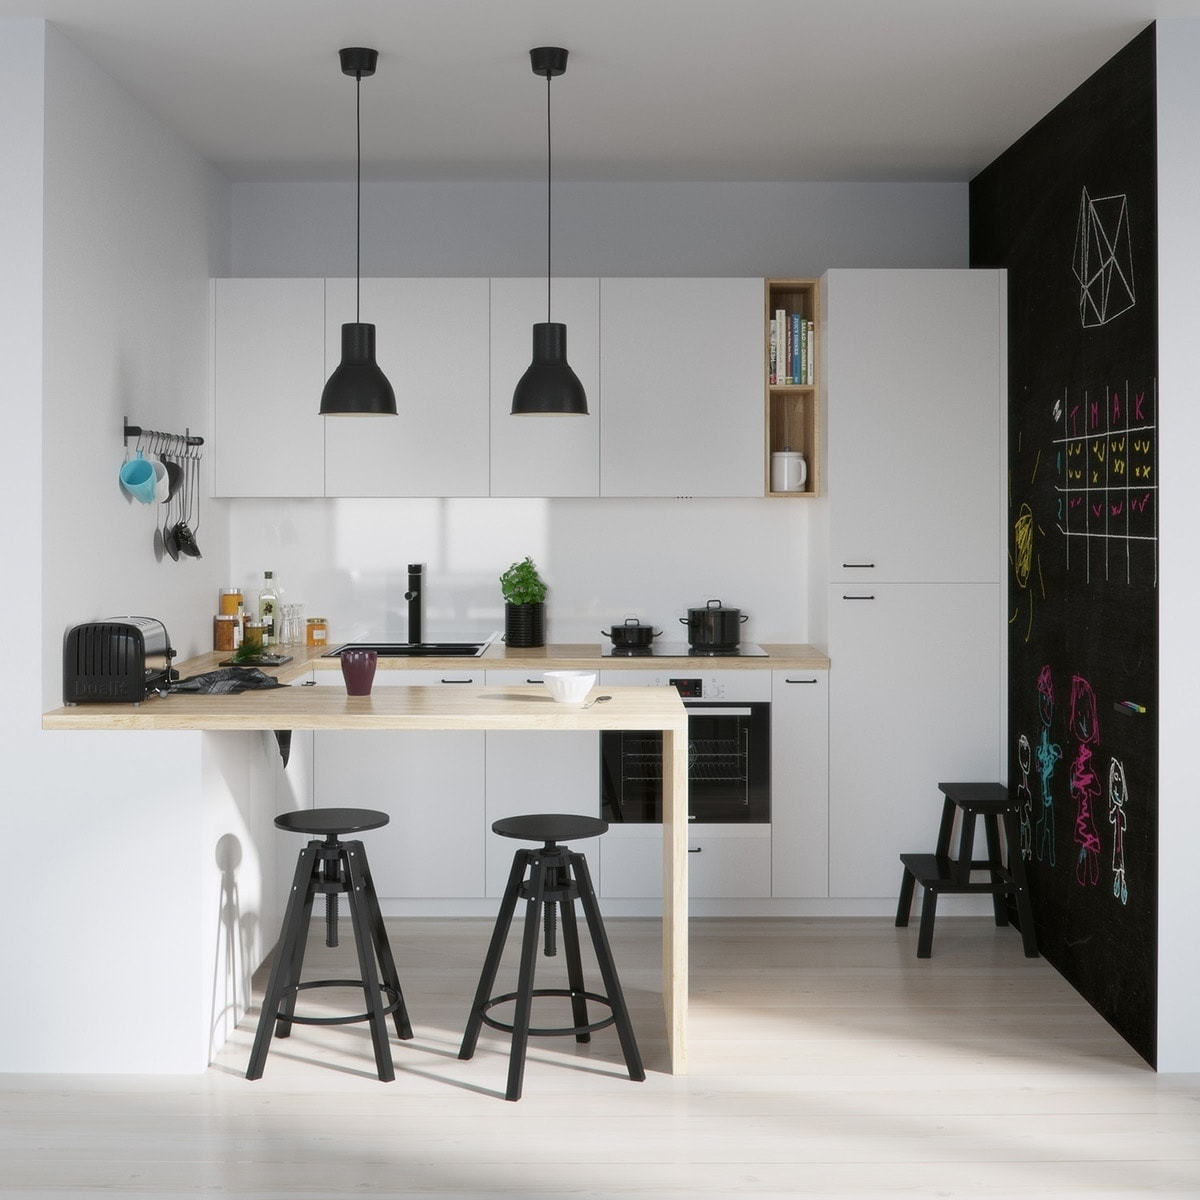 ikea dalfred stool in black in monochromatic kitchen